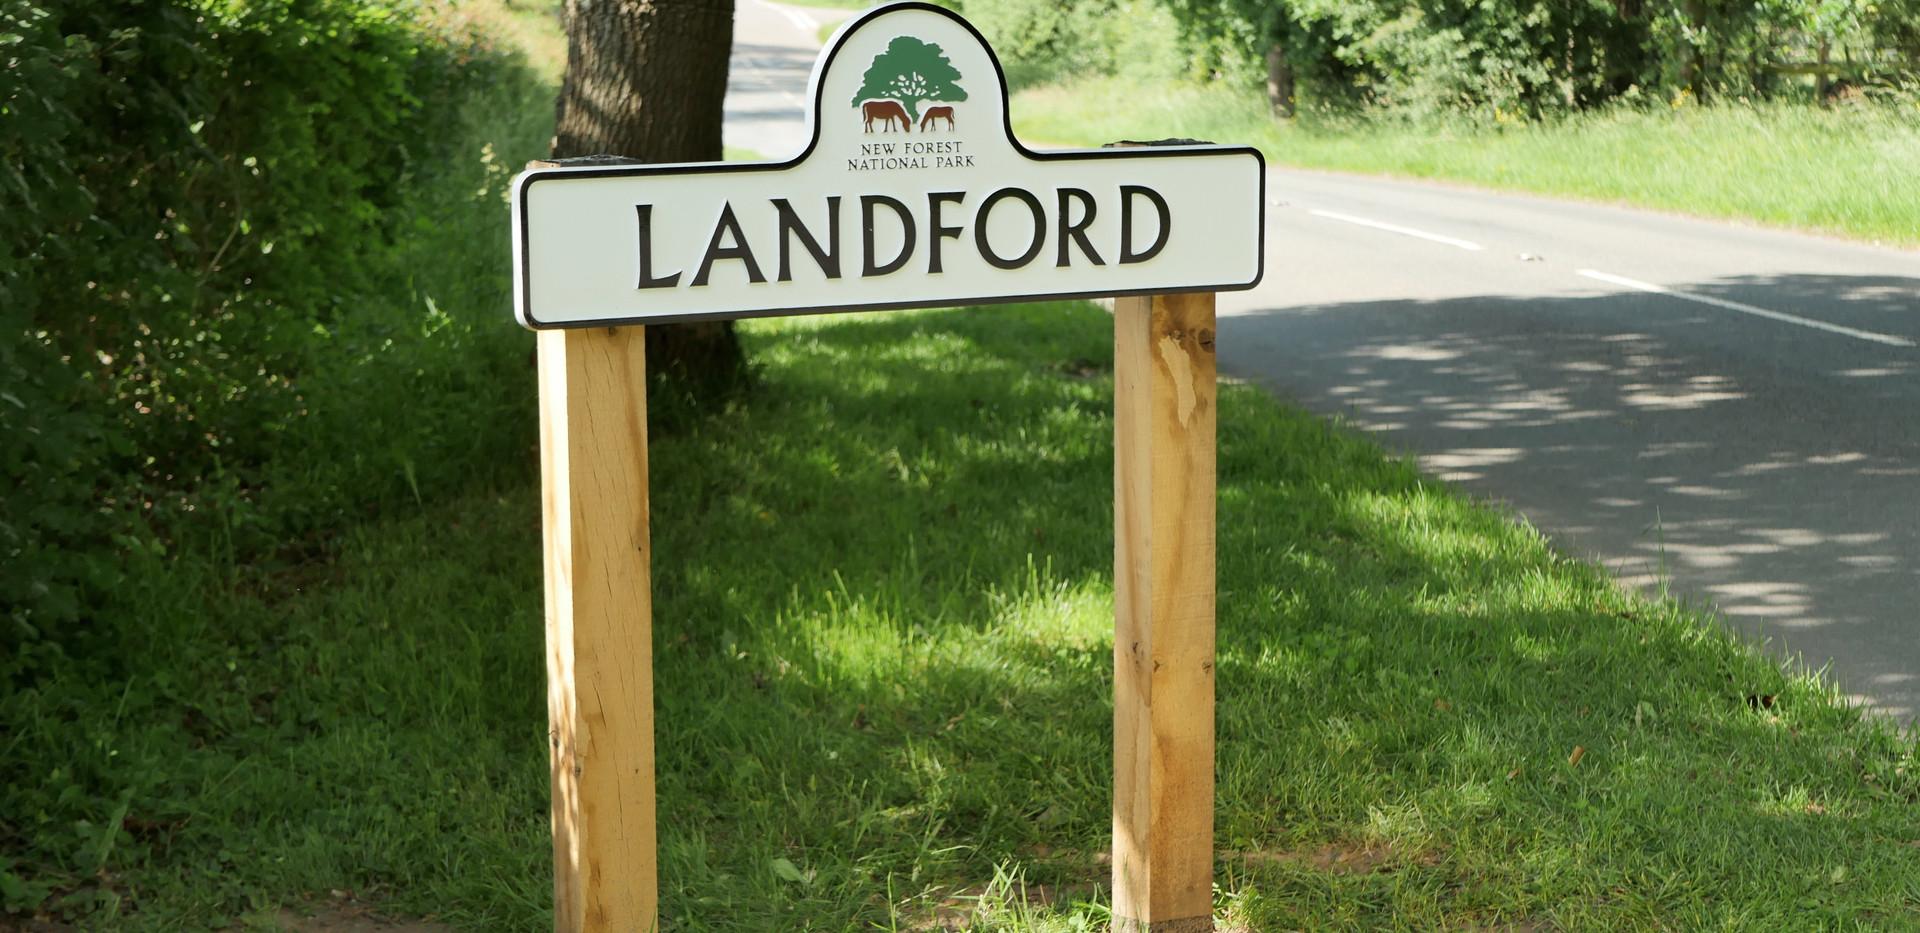 The new Landford Village sign